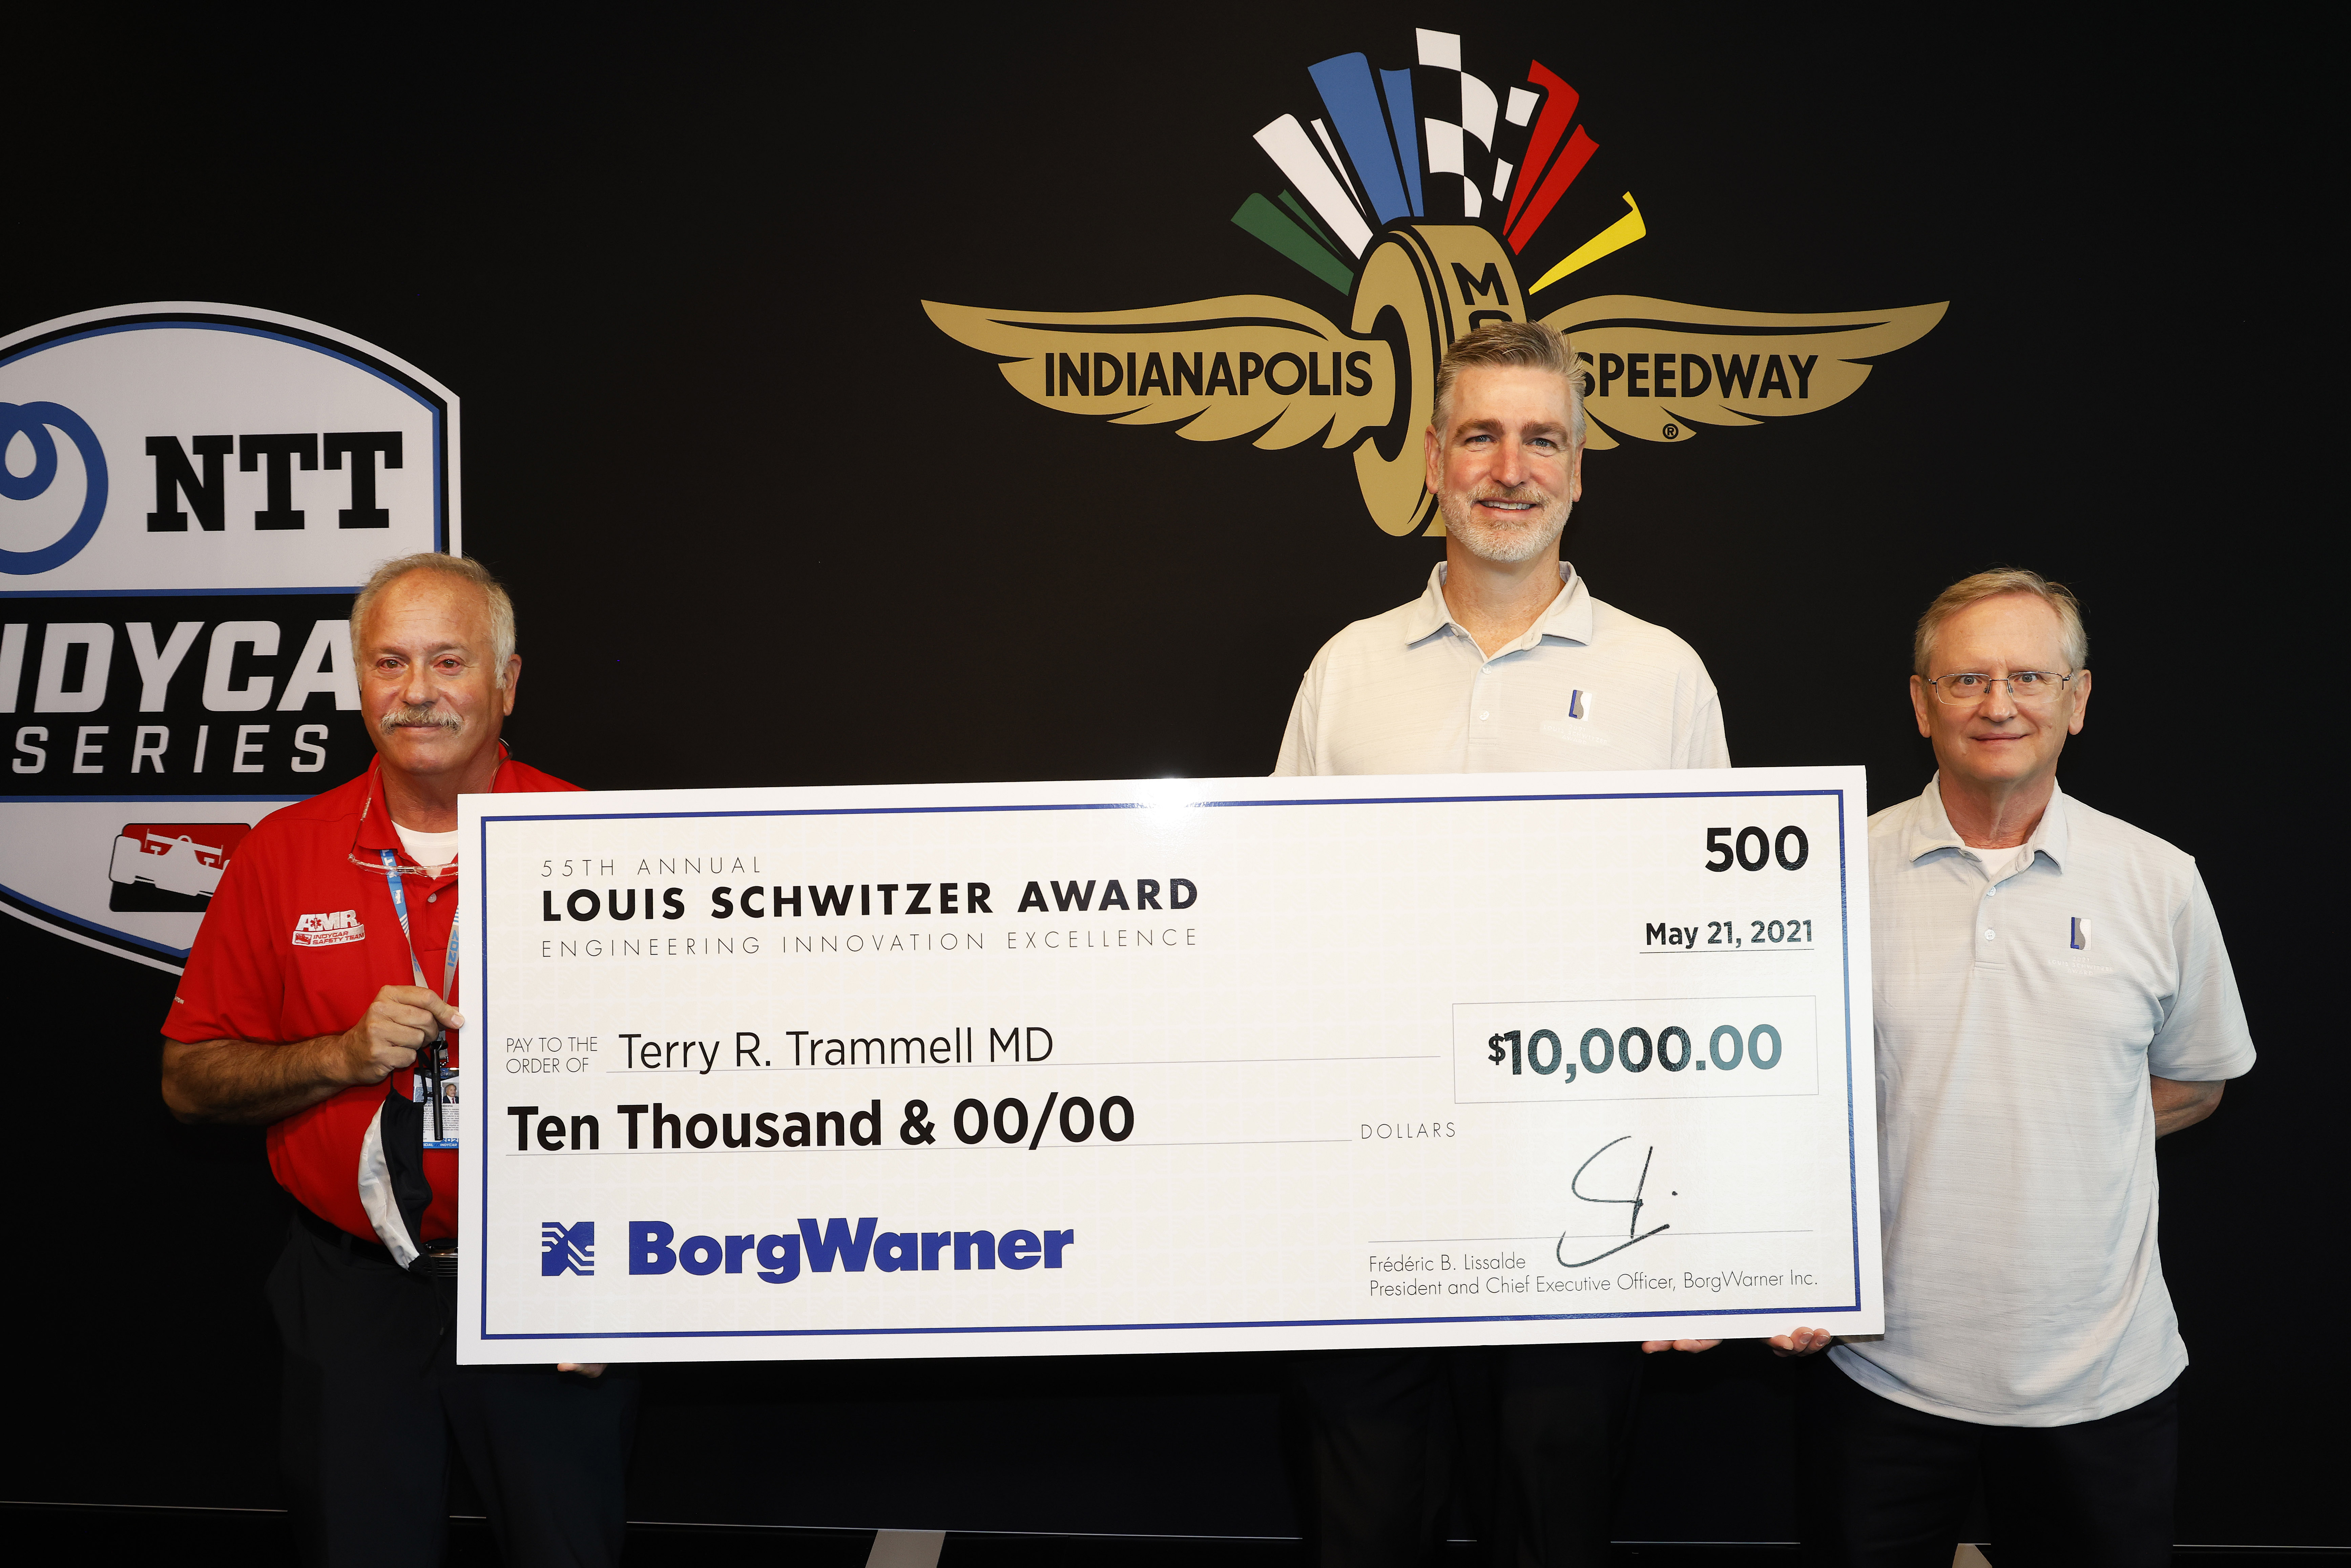 Three men hold large check against black logo backdrop